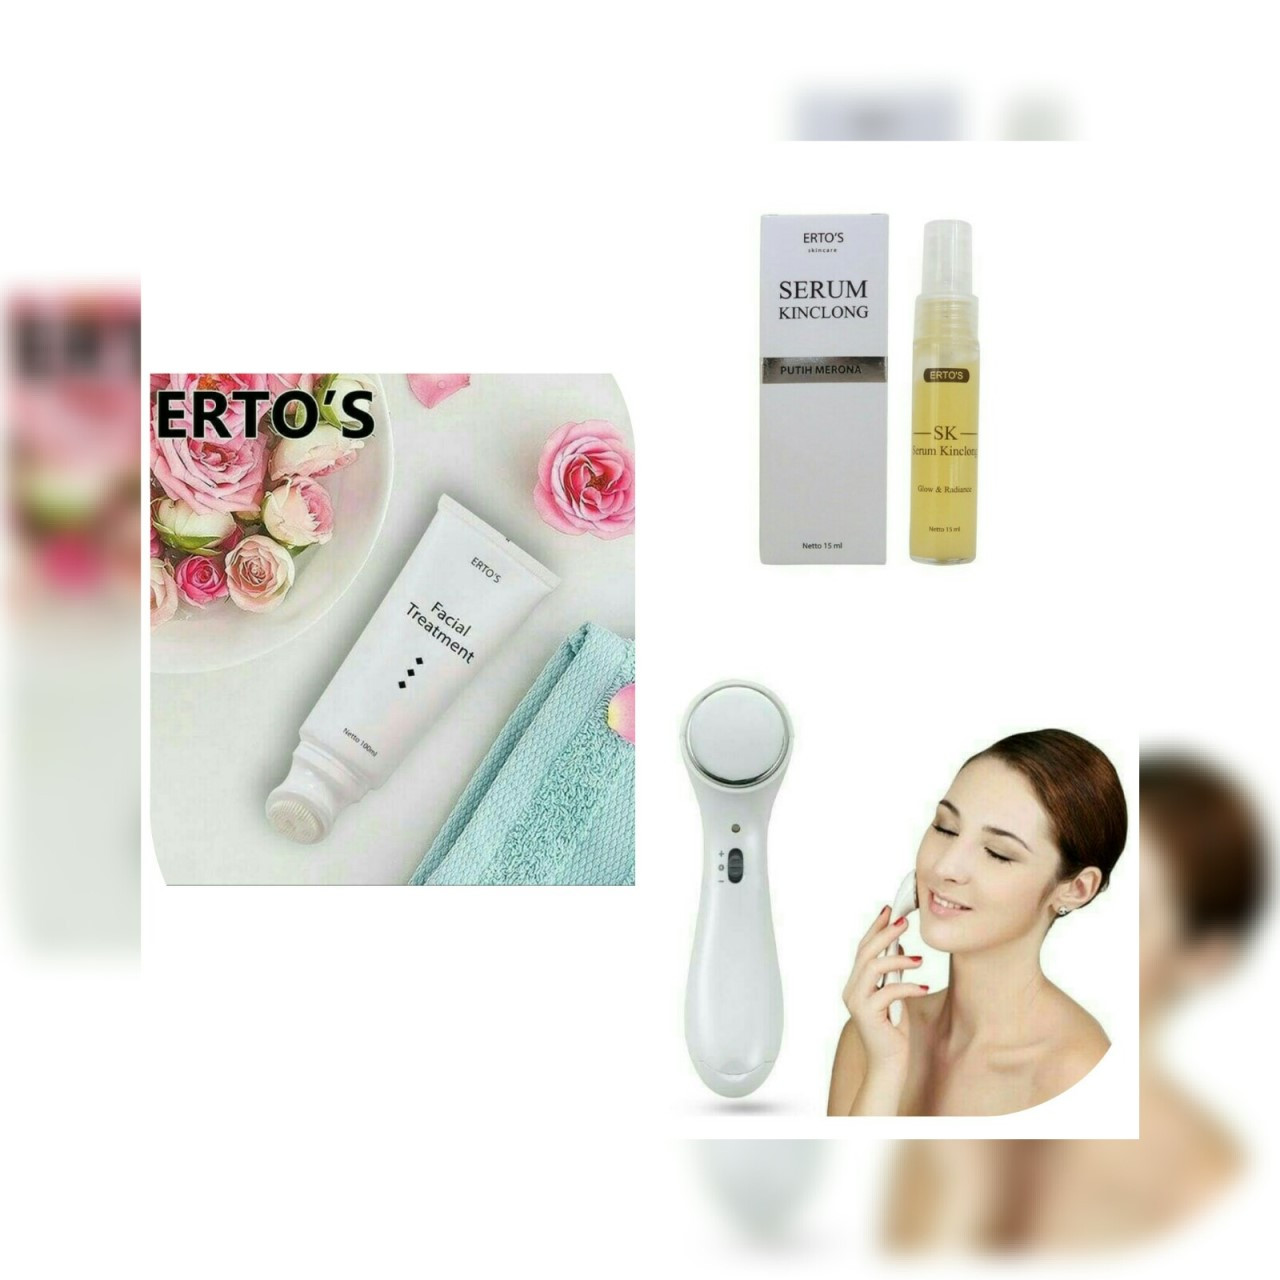 Oisei Store Shop Line Ertos Paket Glowing 1 Kecantikan